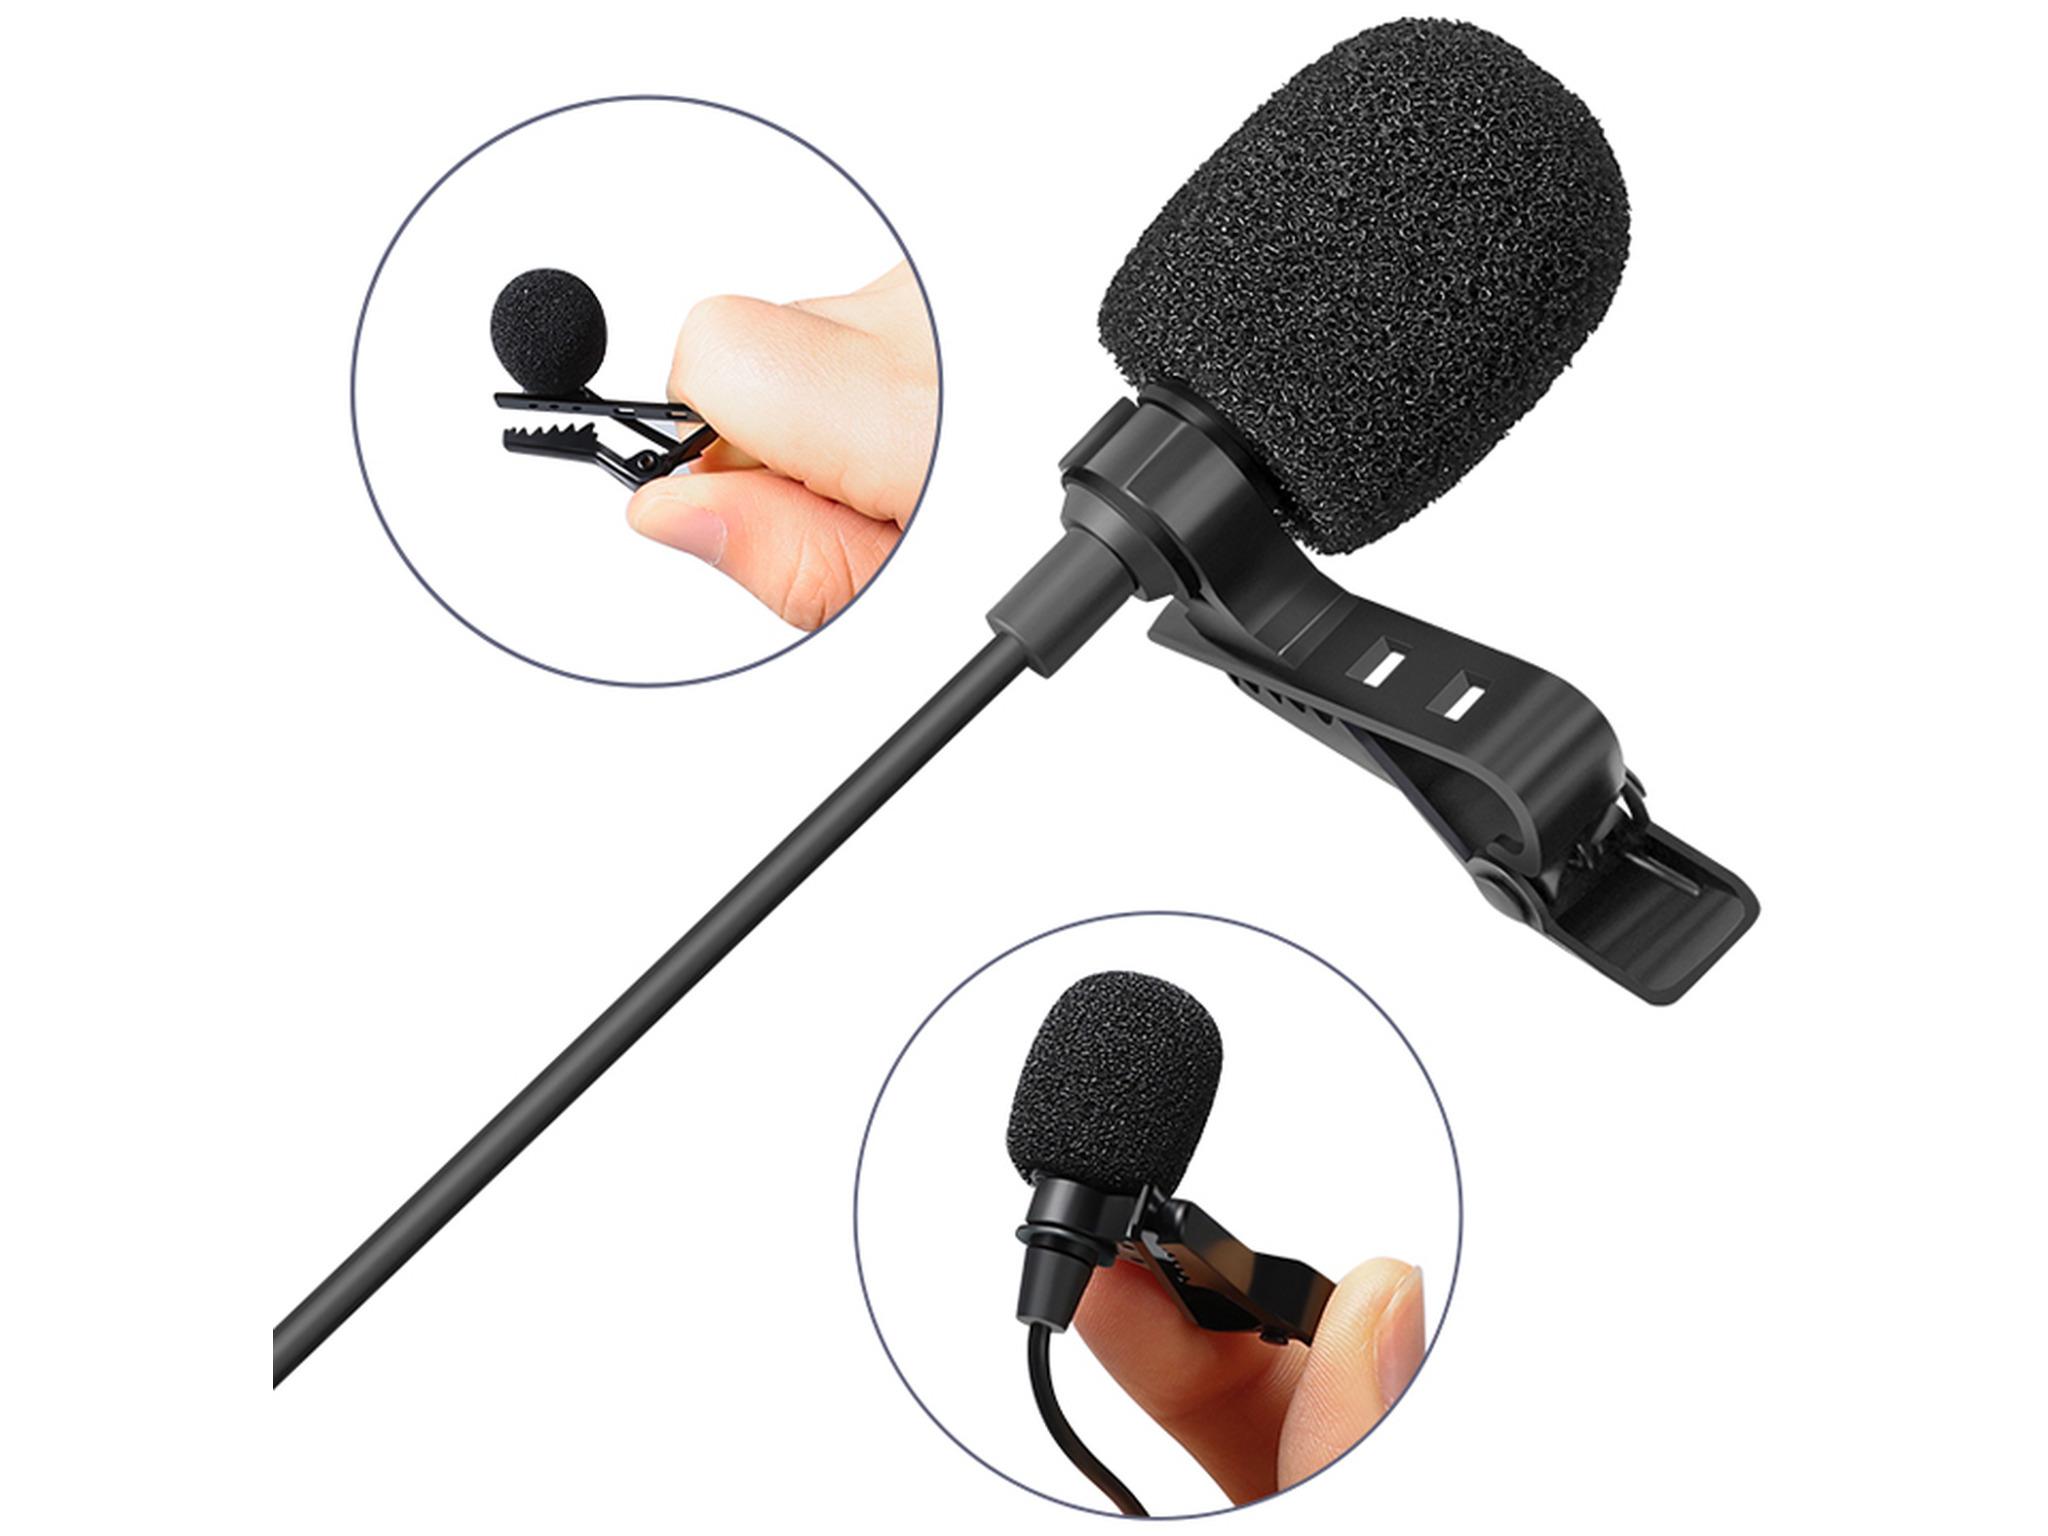 Sandberg Streamer USB Clip on Microphone, lavalier